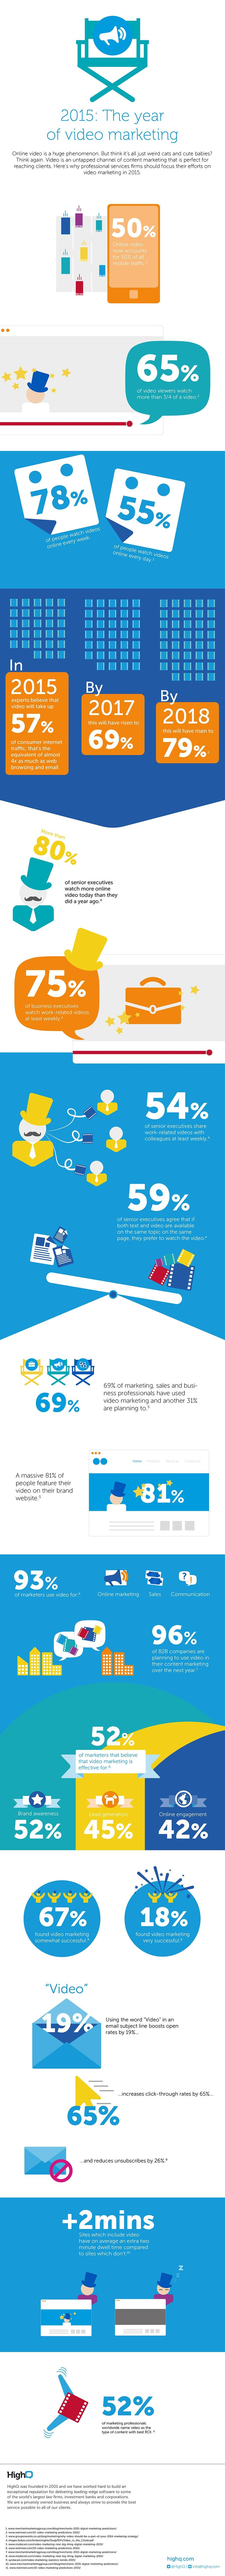 infografika - reklama video